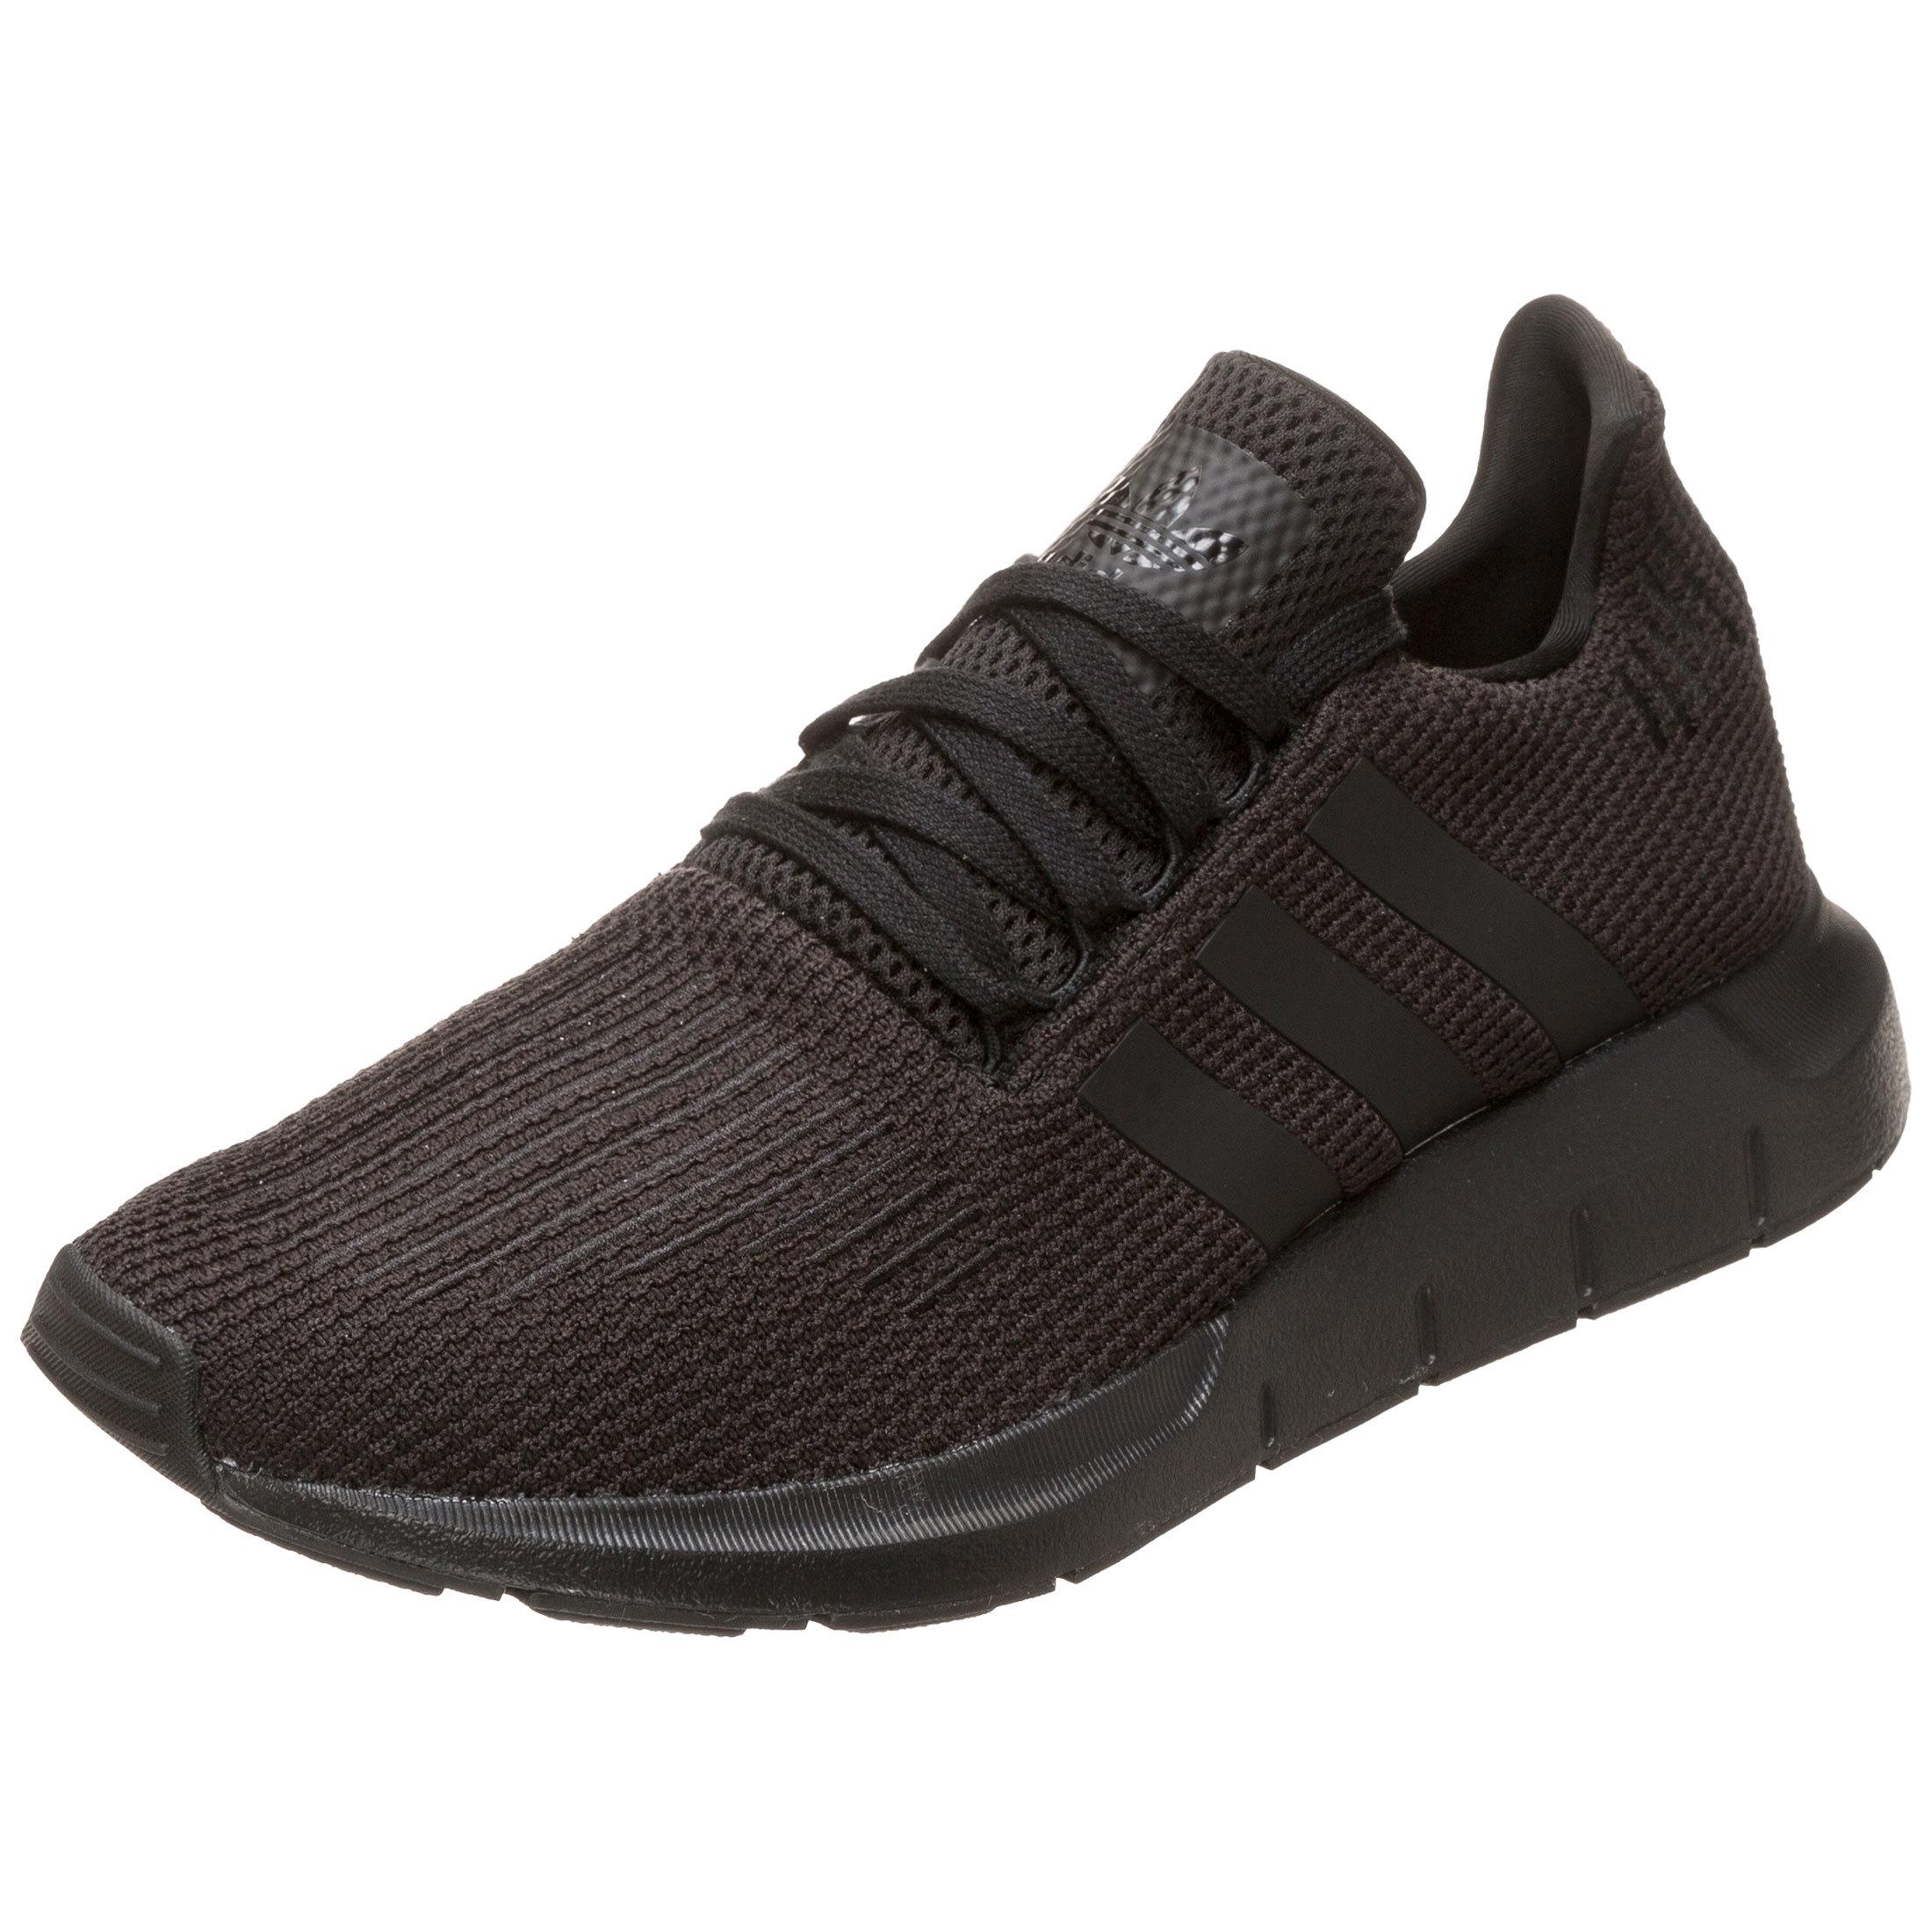 1b5d90a6a6c33 adidas Swift Run Shoes